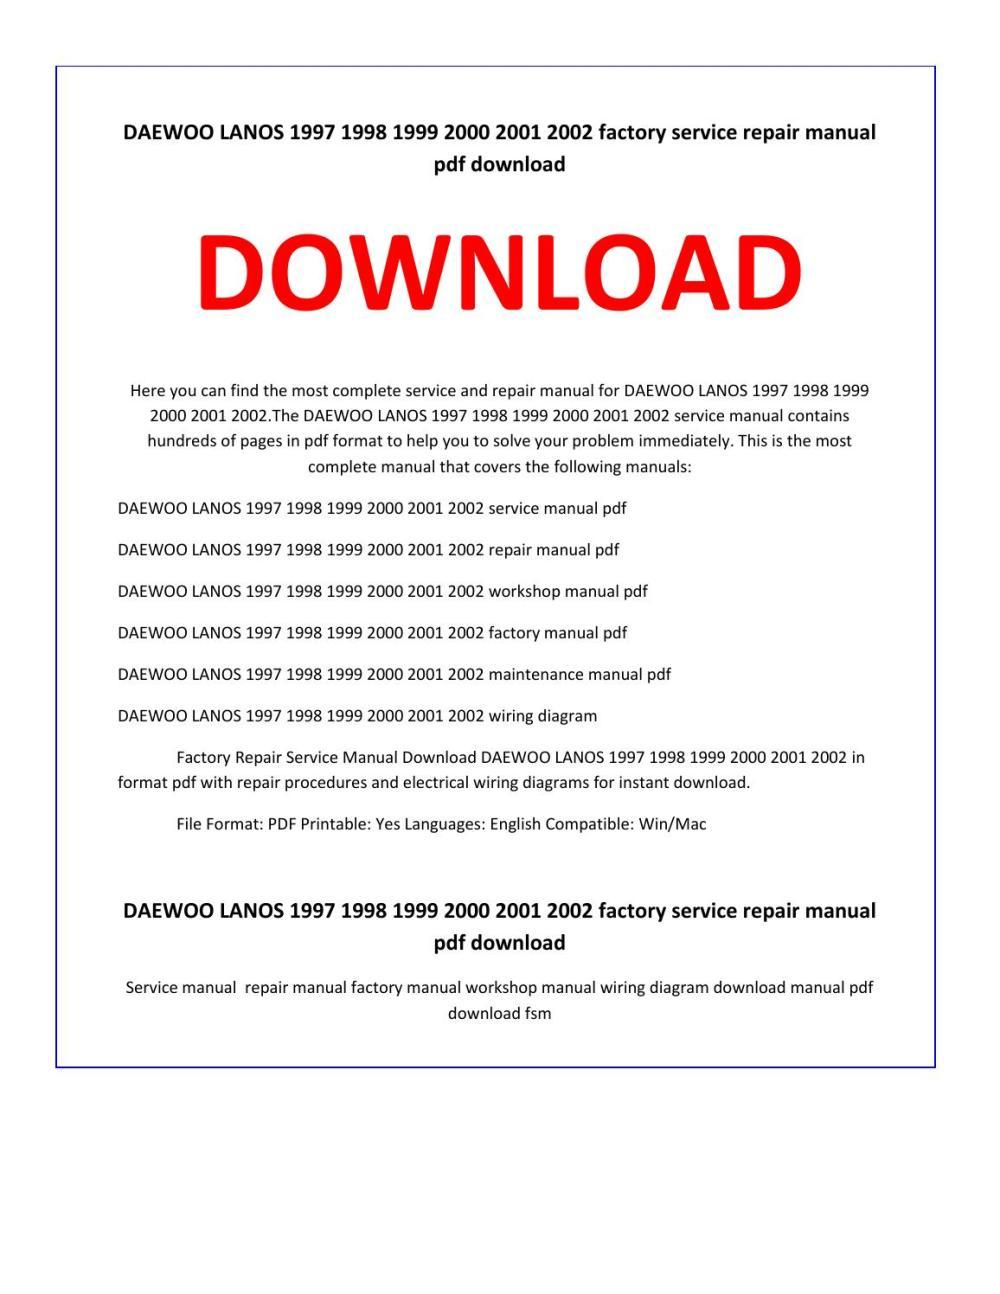 medium resolution of daewoo lanos 1997 1998 1999 2000 2001 2002 service repair manual